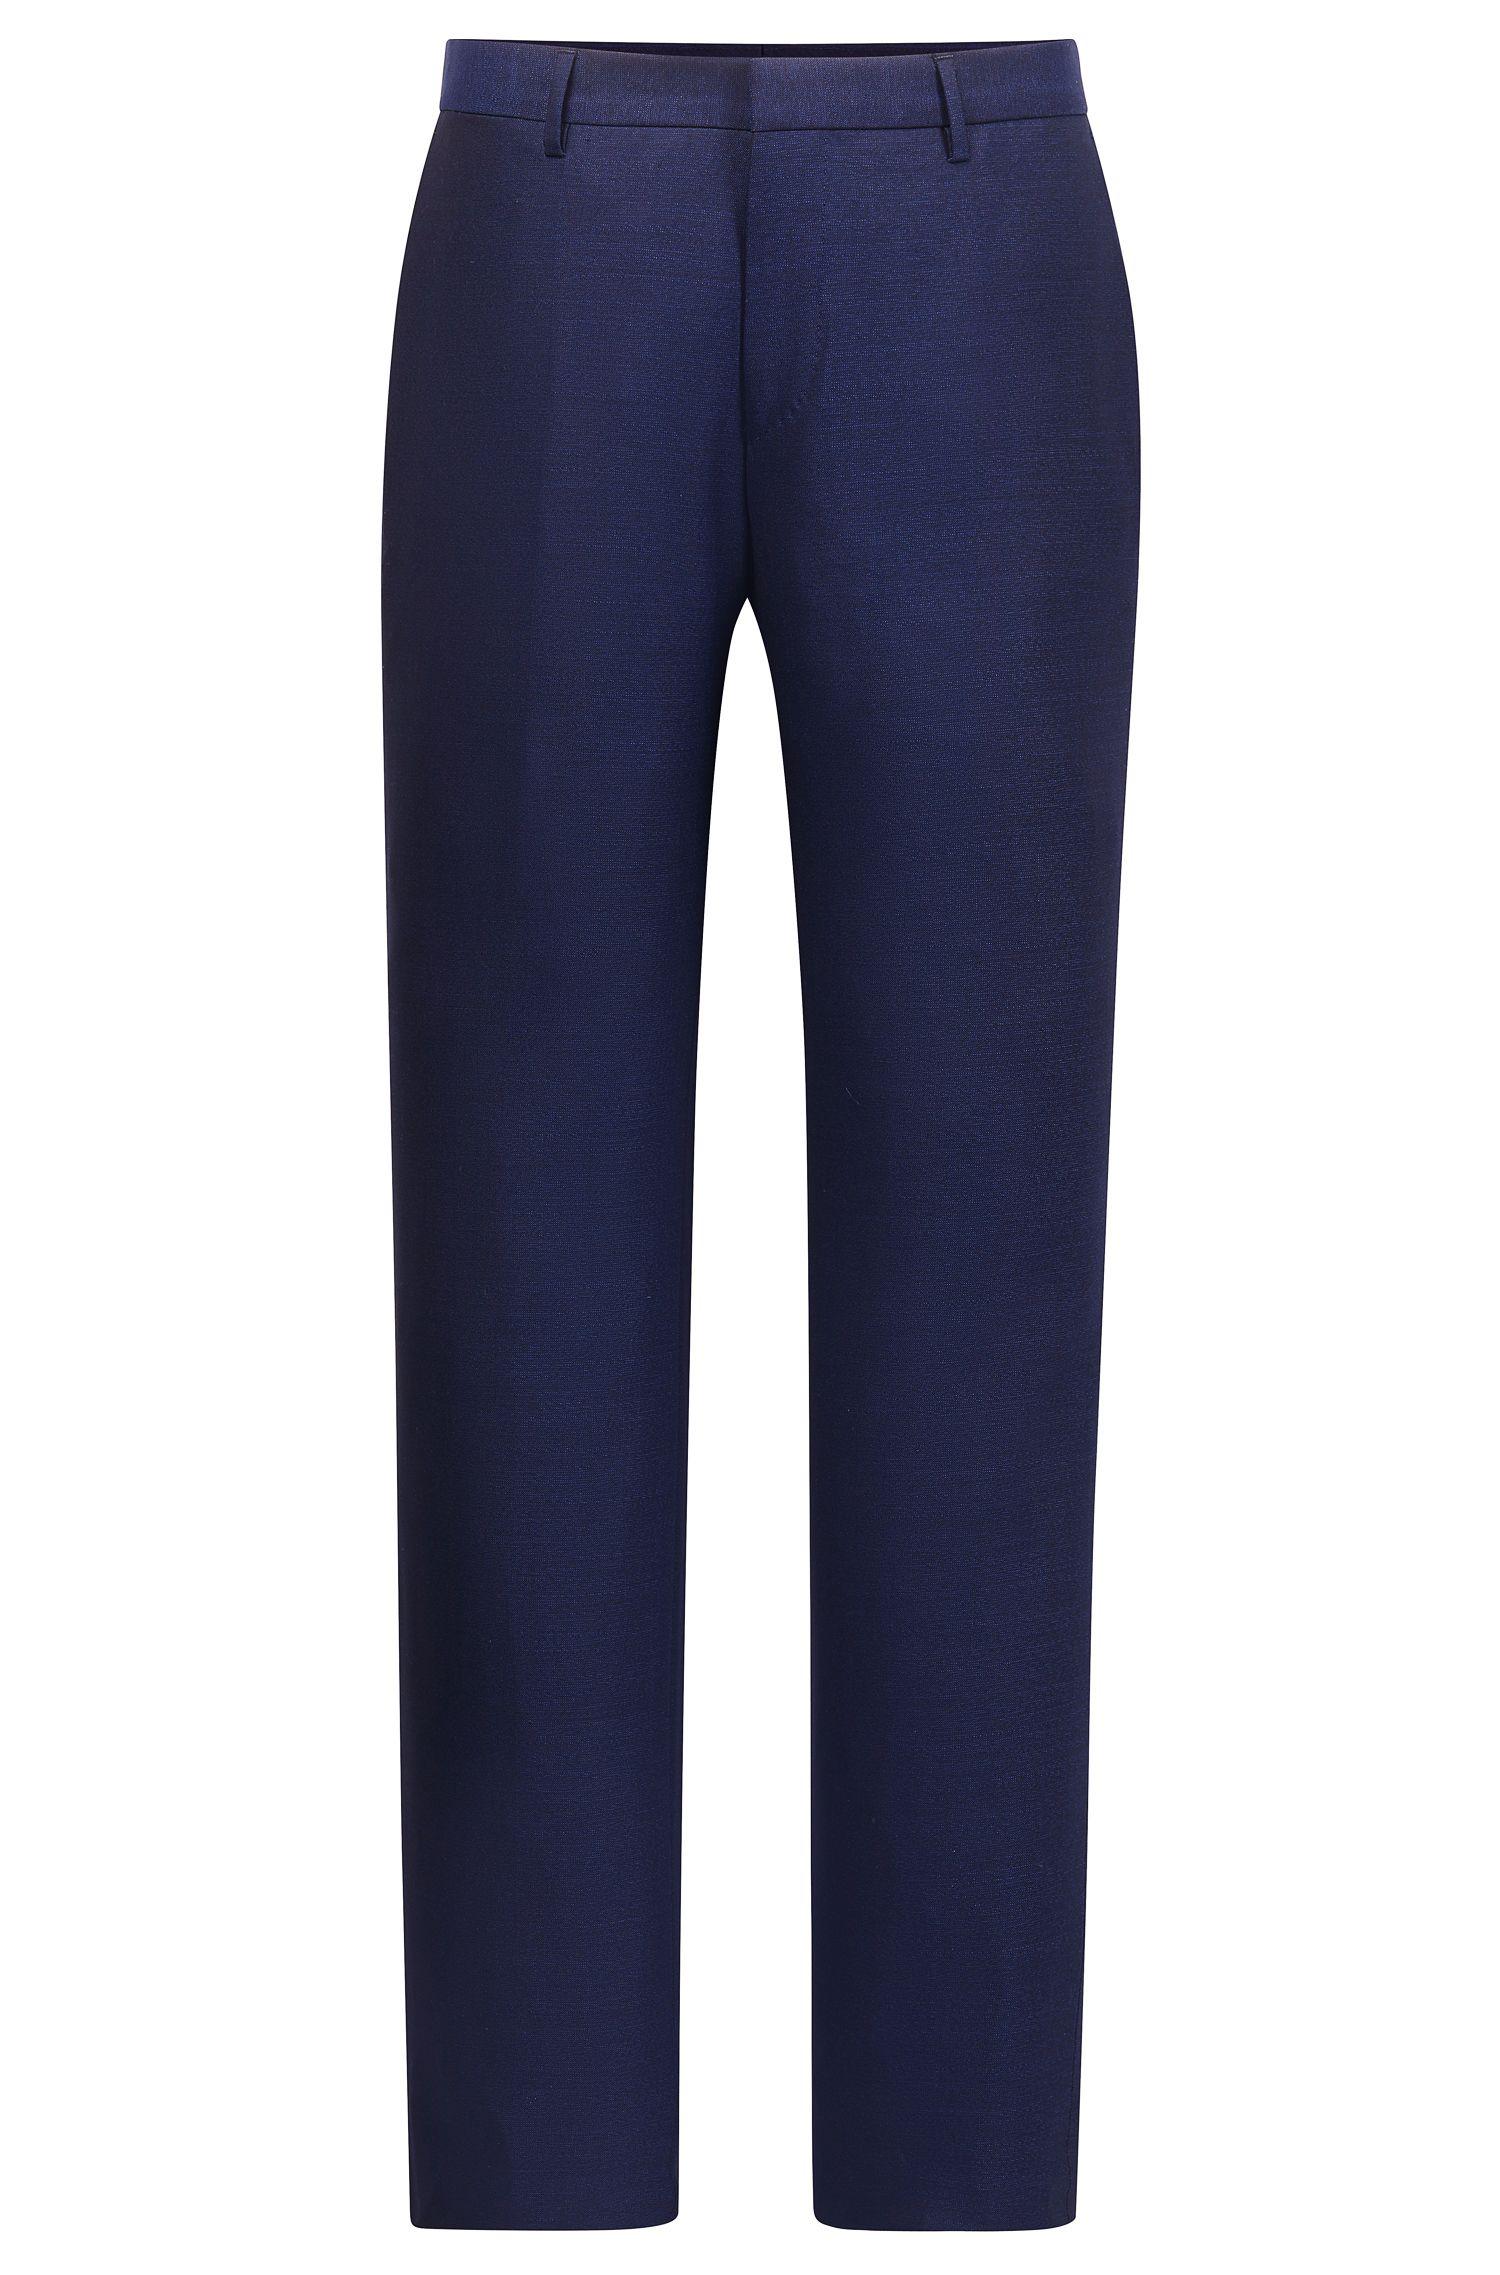 'T-Gleeve'   Slim Fit, Italian Virgin Wool Dress Pants